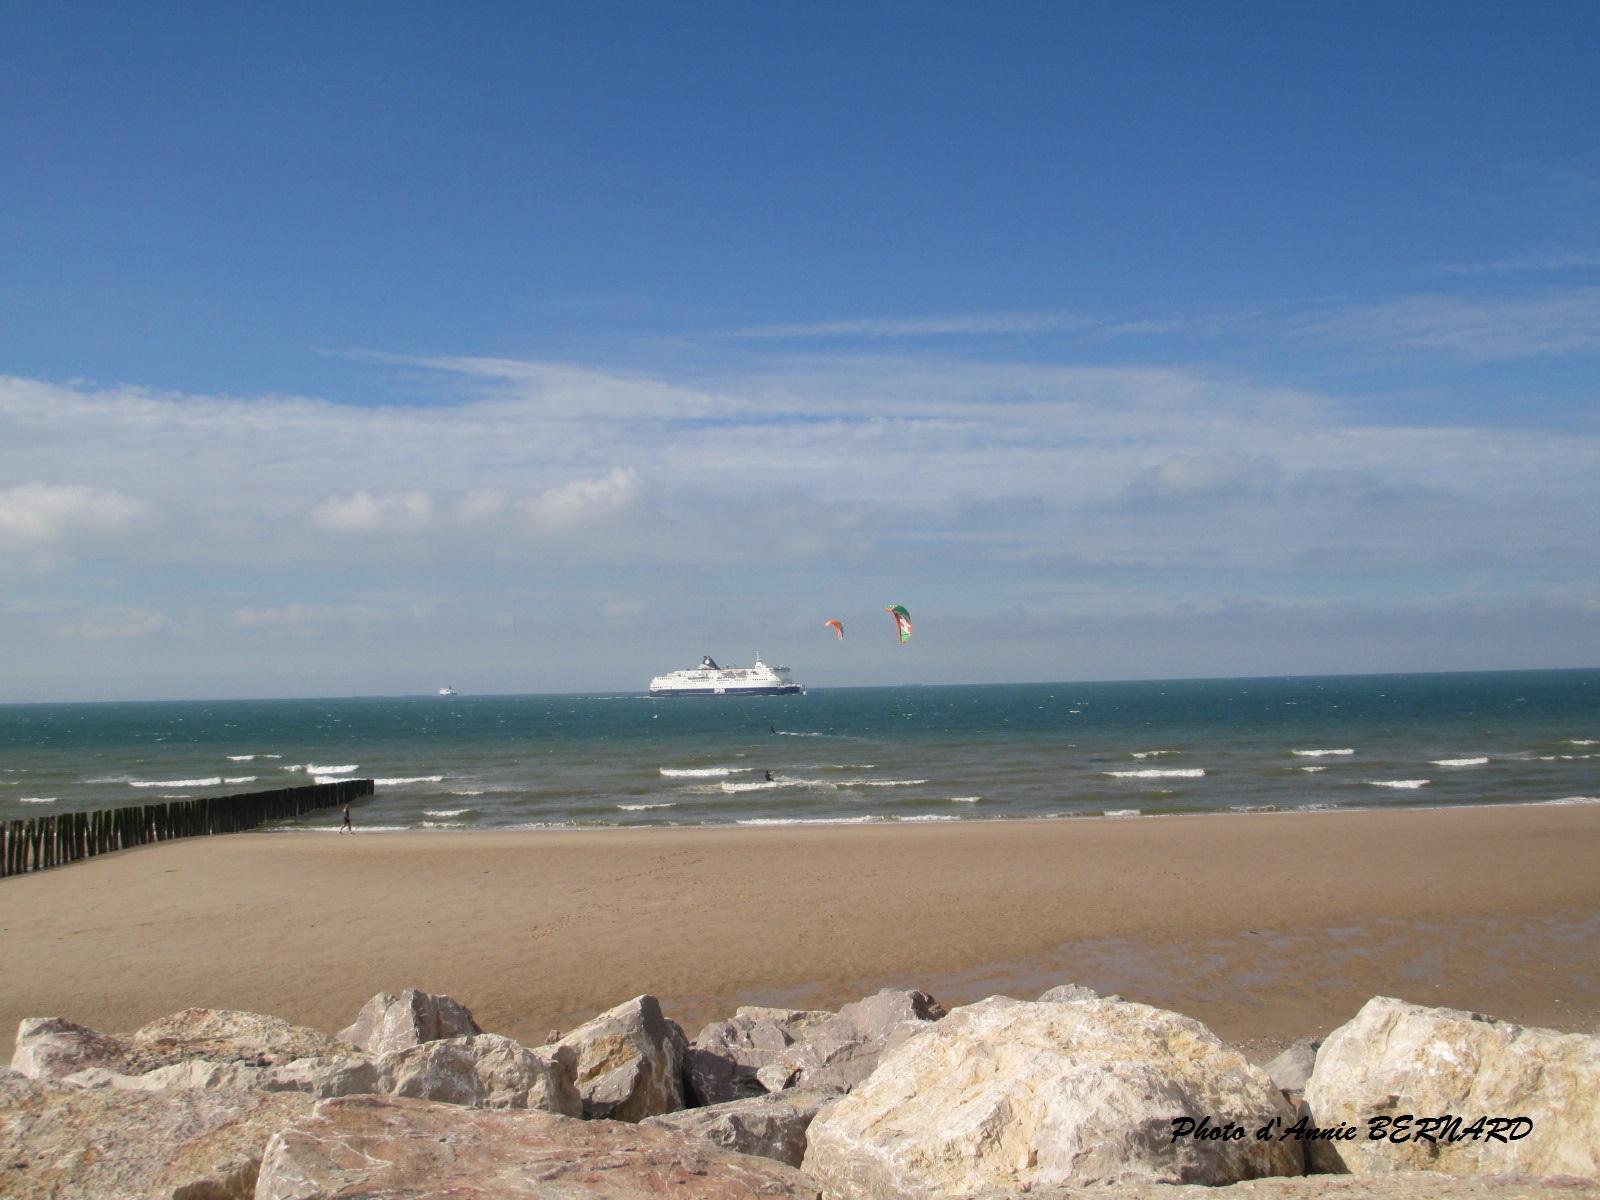 Trafic maritime au loin